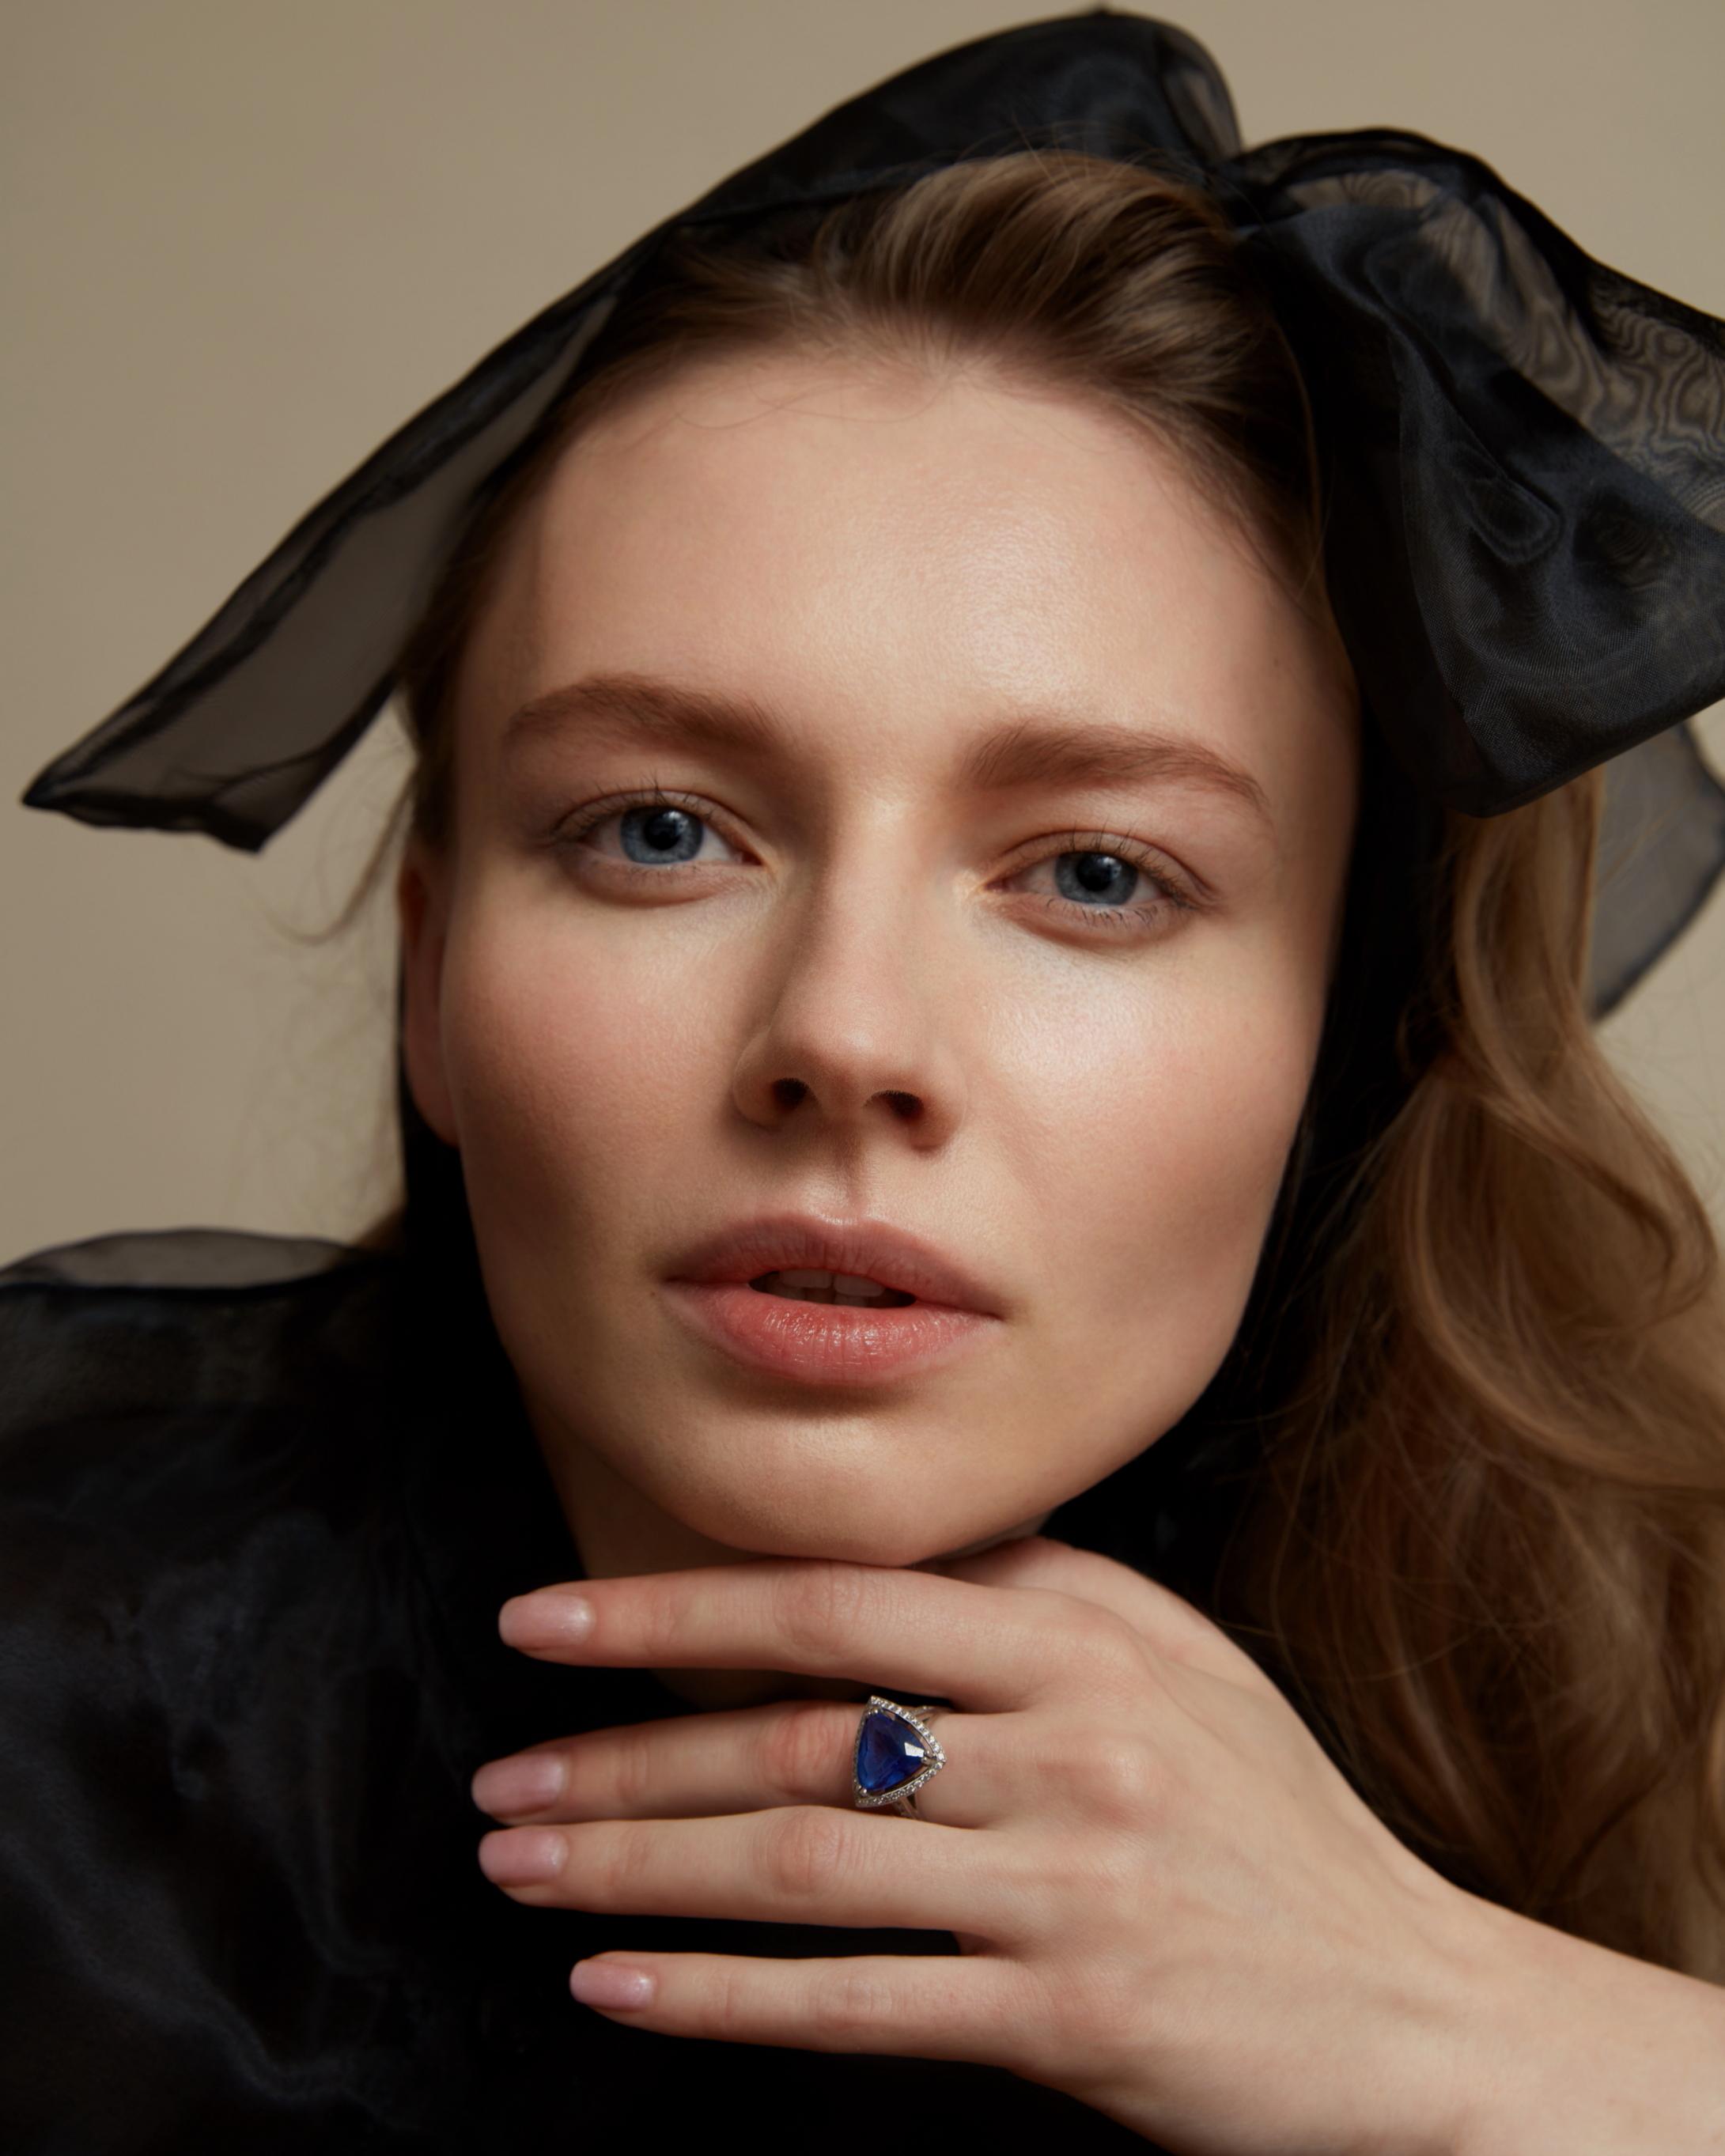 Tali beauty_jewellery-iakovos (2)